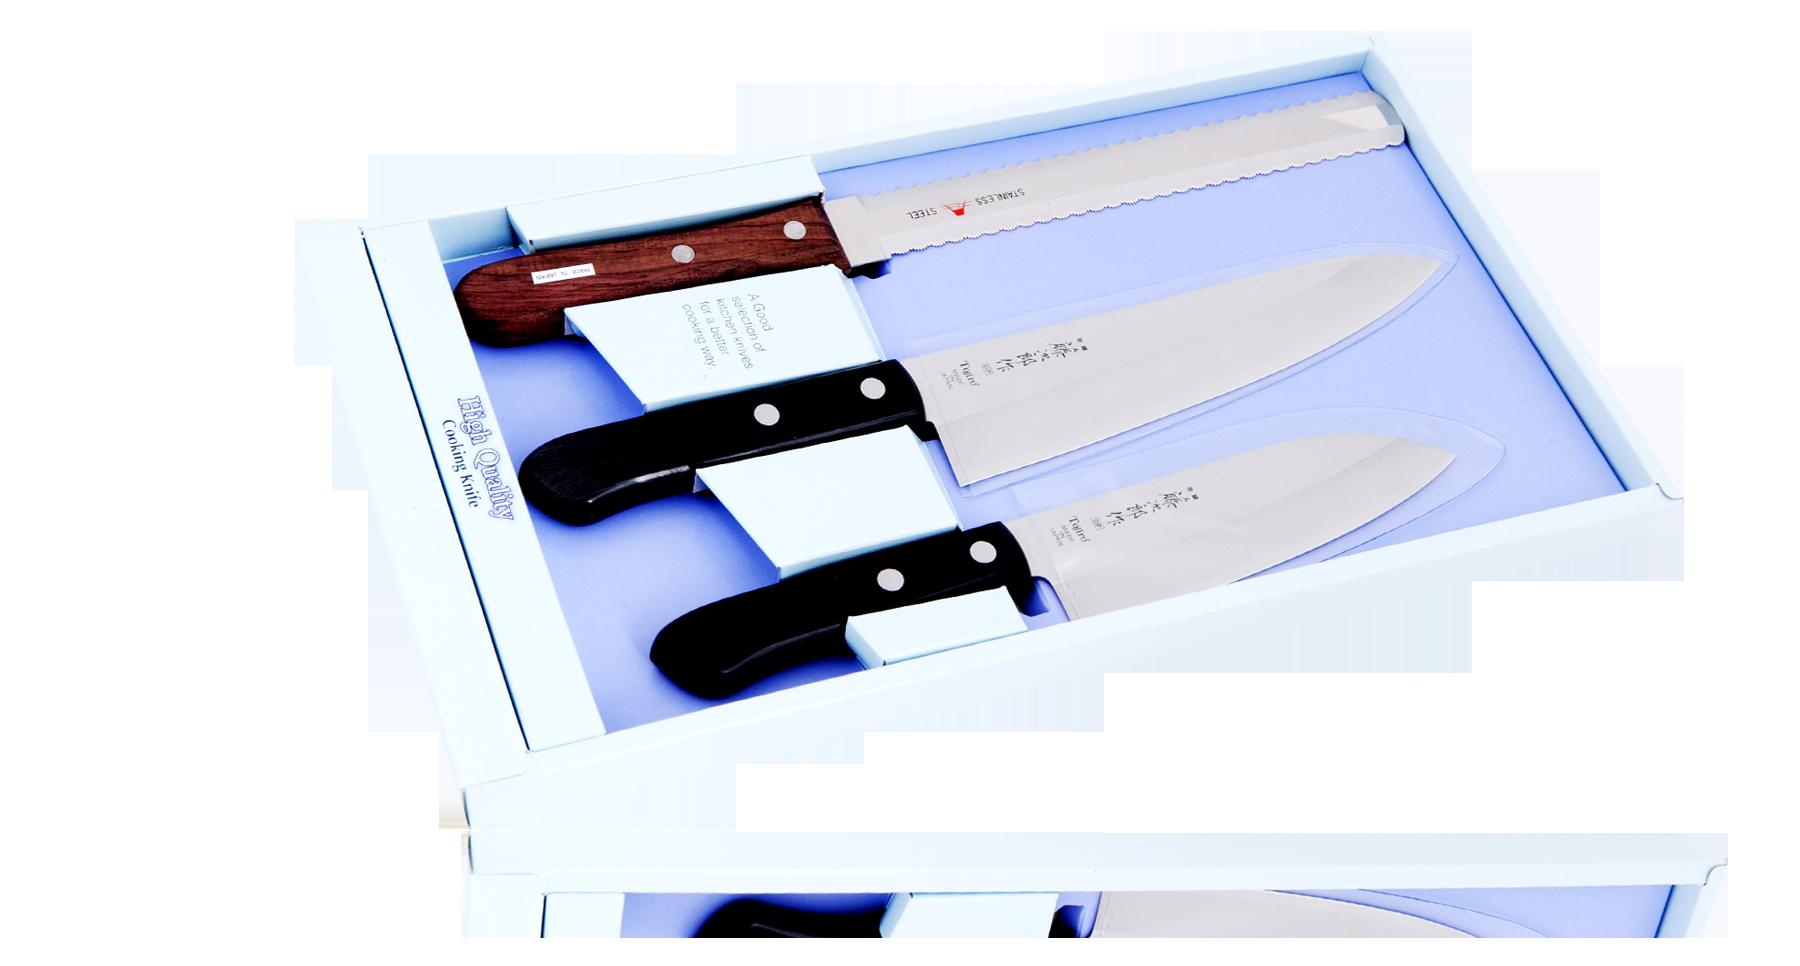 Набор ножей FG-82 Tojiro